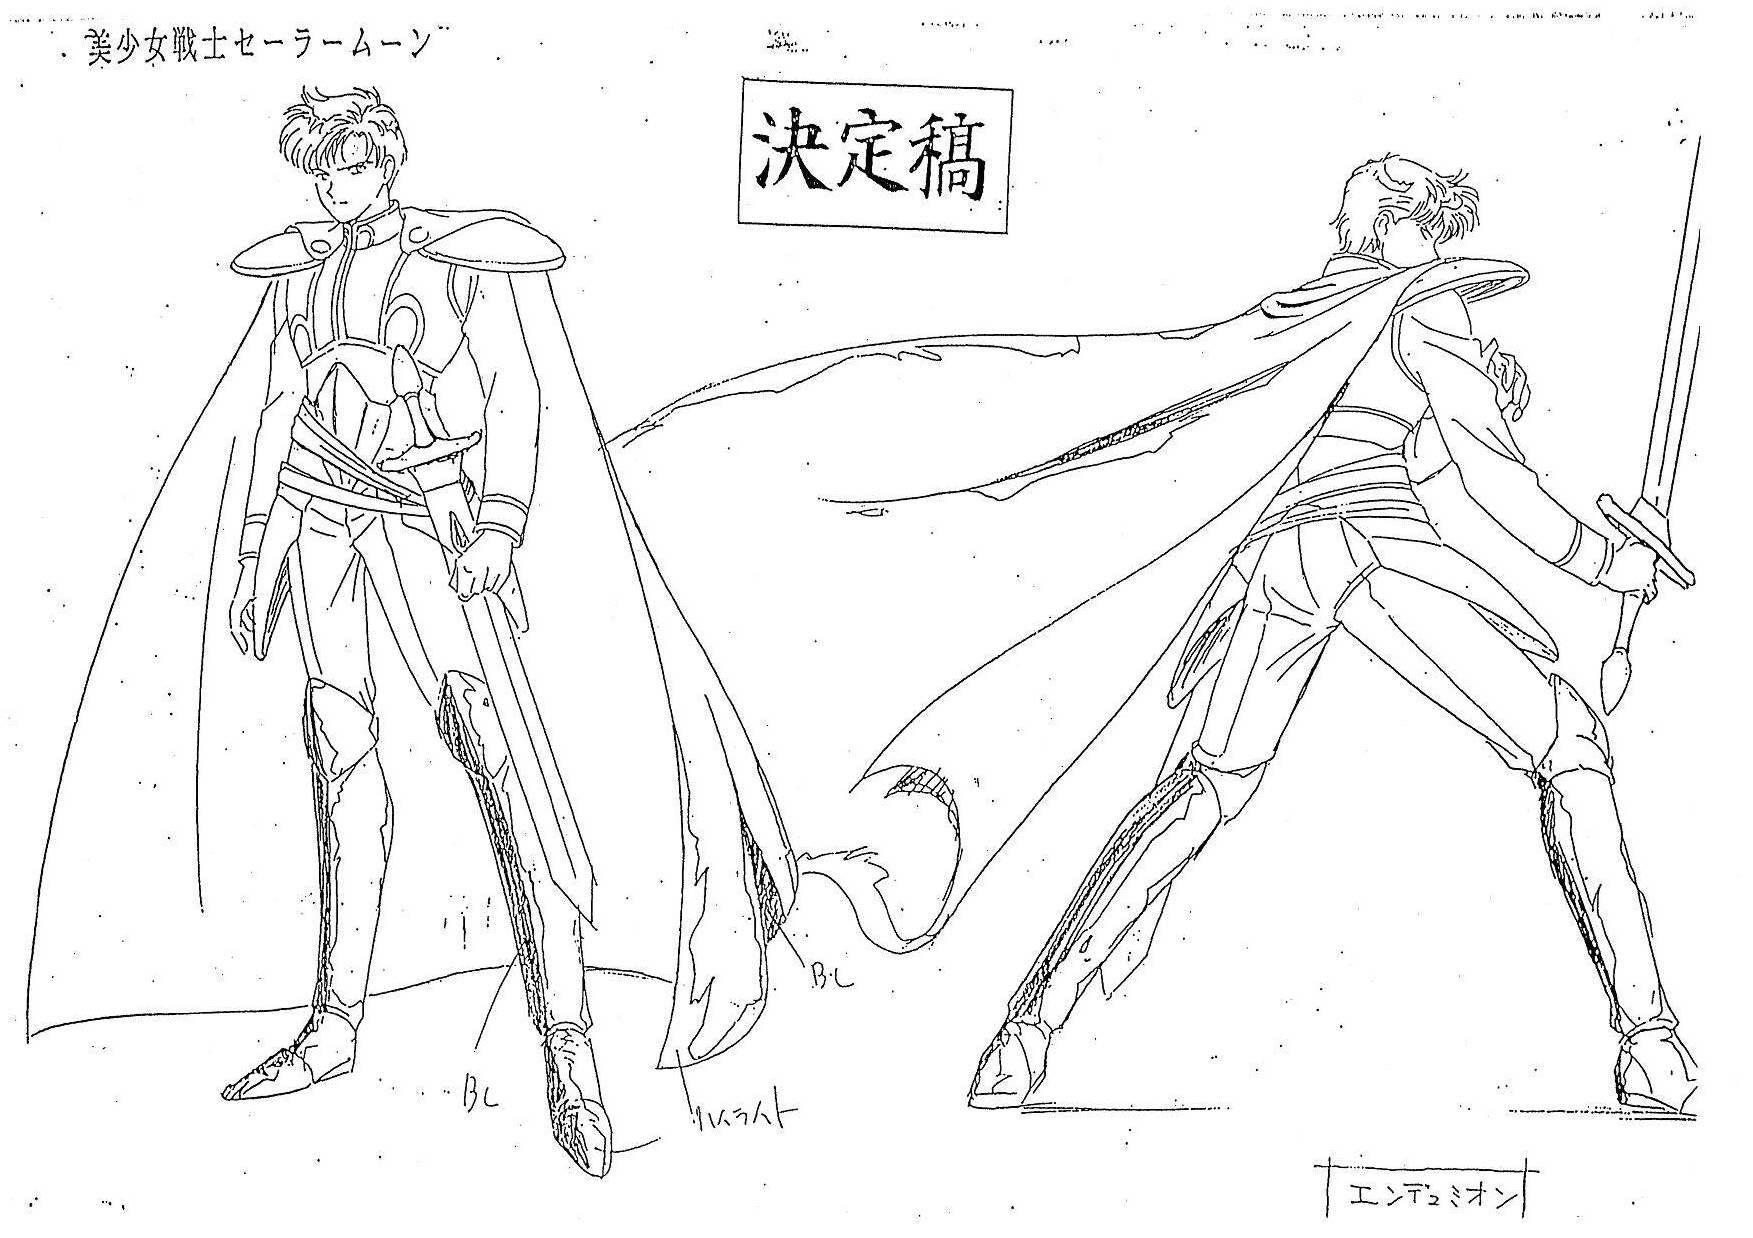 Sailor Moon Model Sheets - Prince Endymion